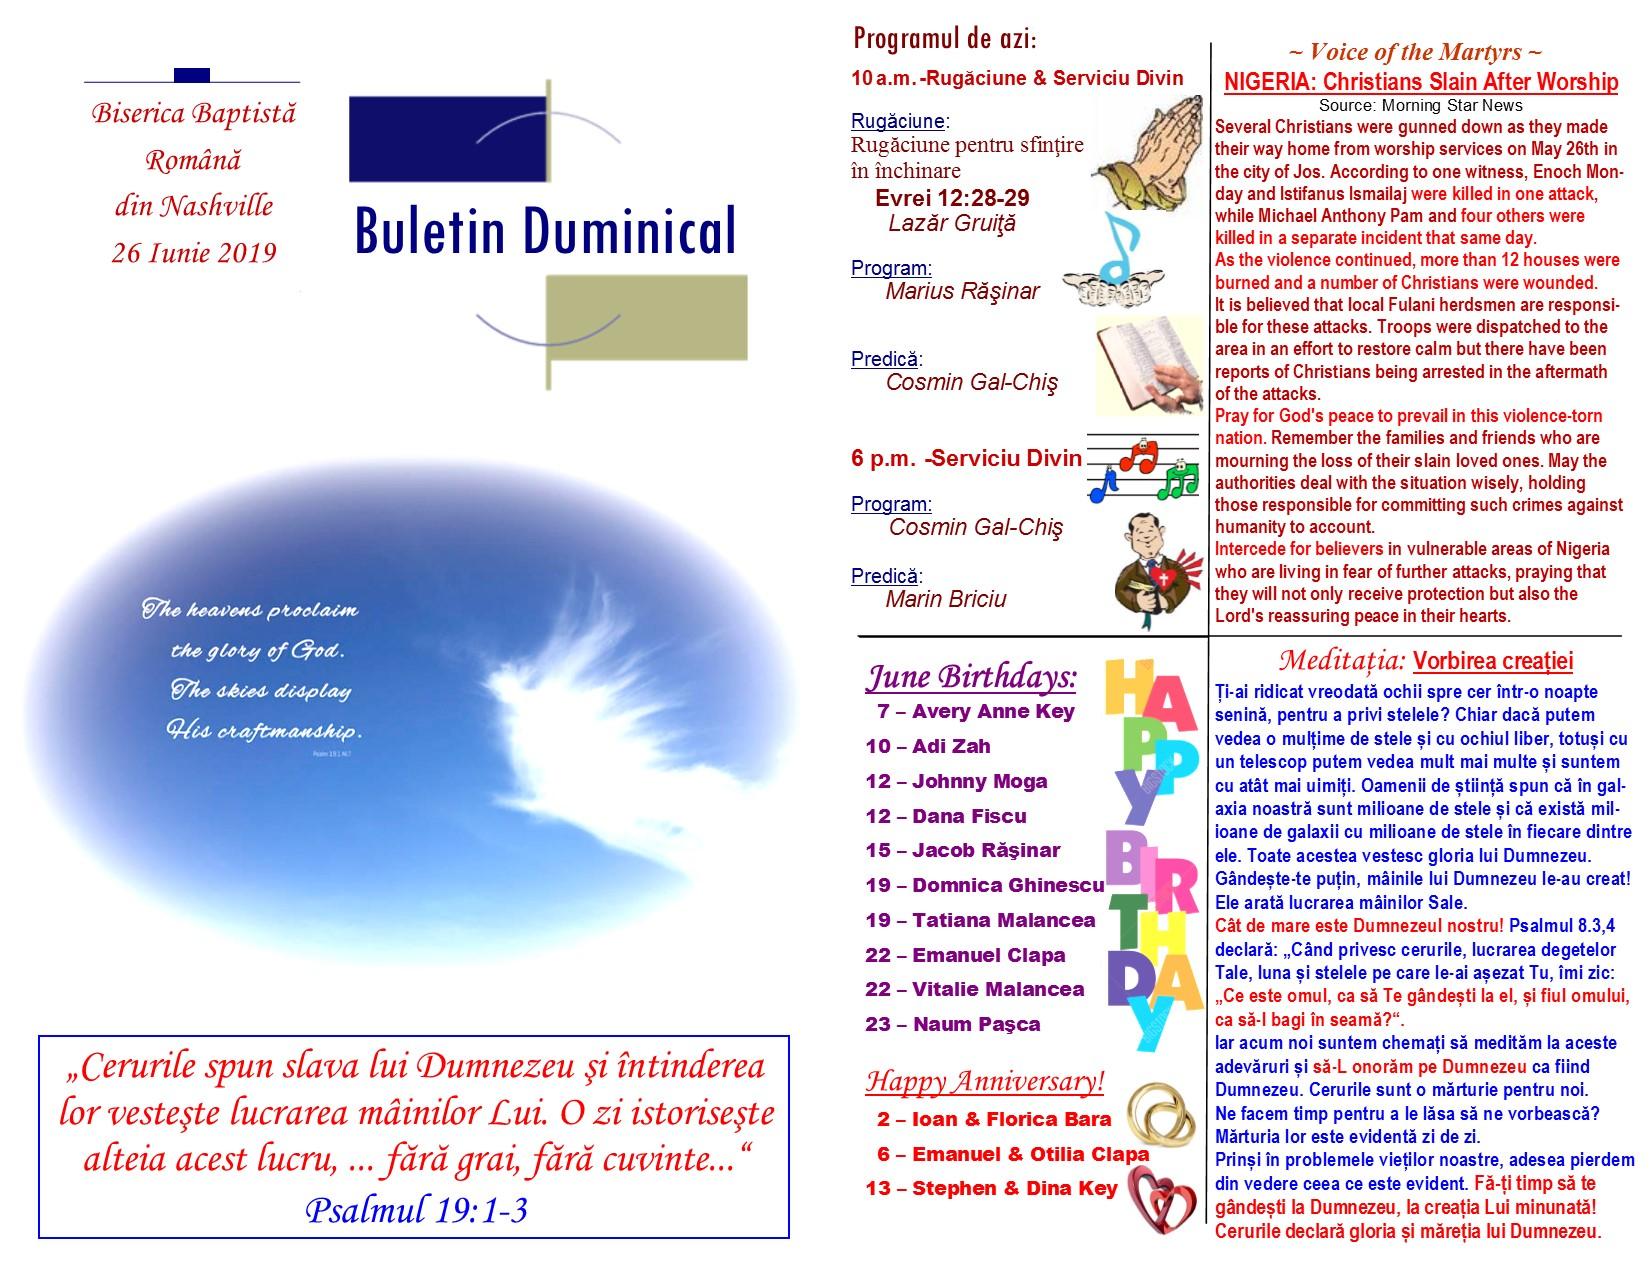 Buletin 06-23-19 page 1 & 2